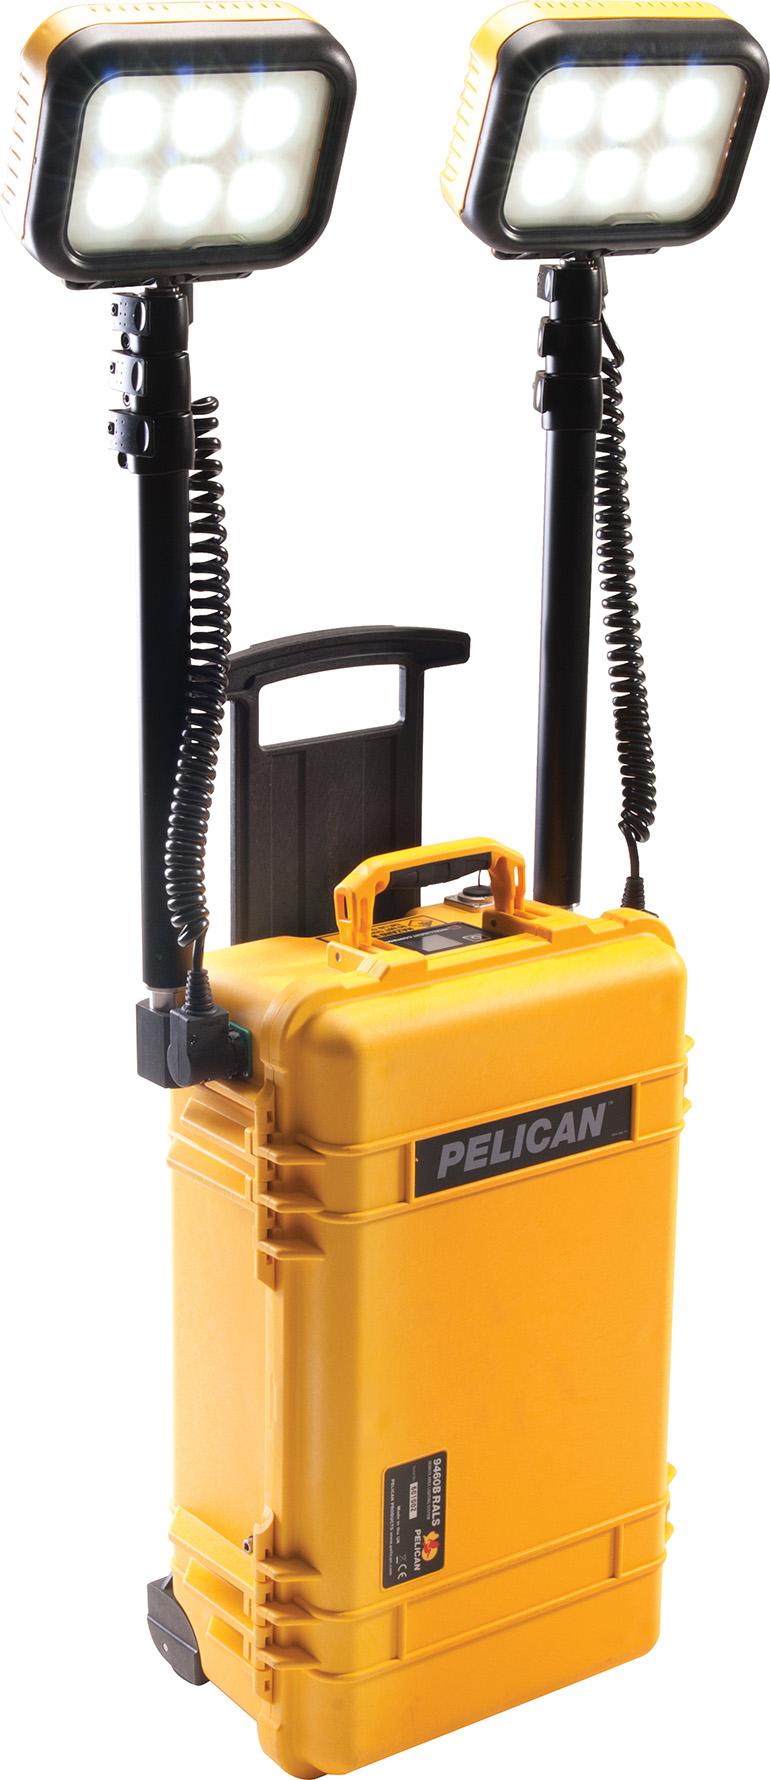 pelican-remote-area-light-9460